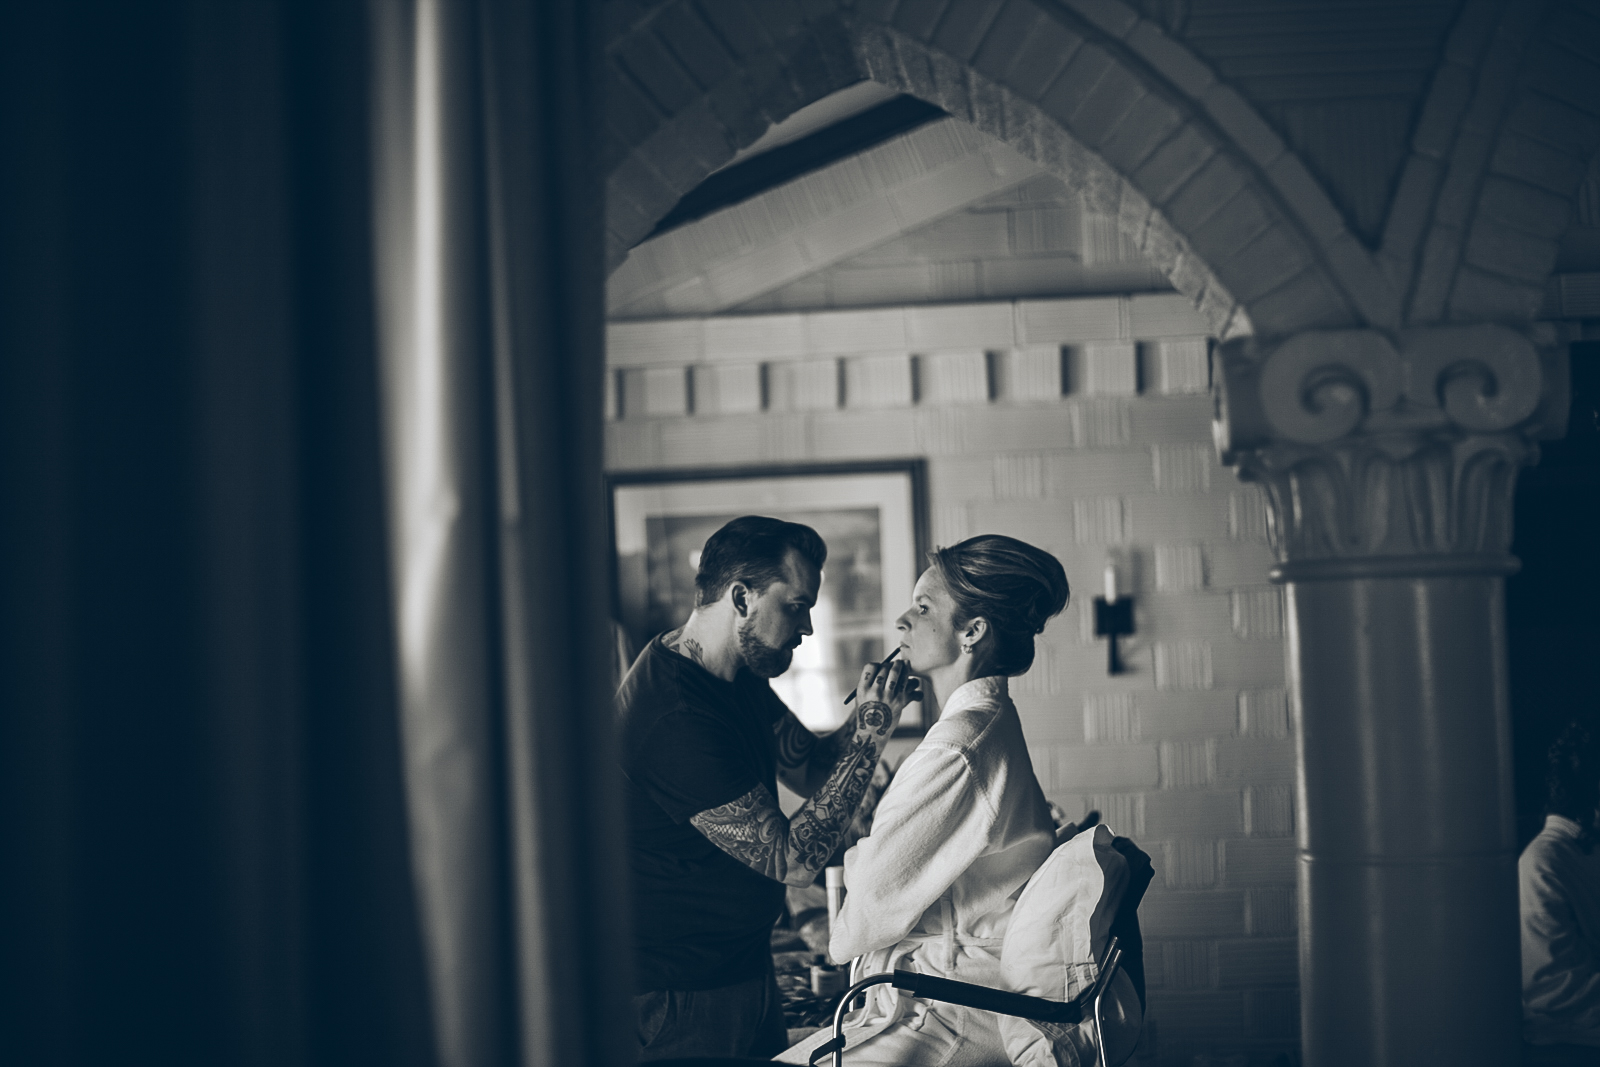 Riverside_ca_wedding_photography_marguerite_carolyn_ebony_siovhan_bokeh_photography_04.jpg